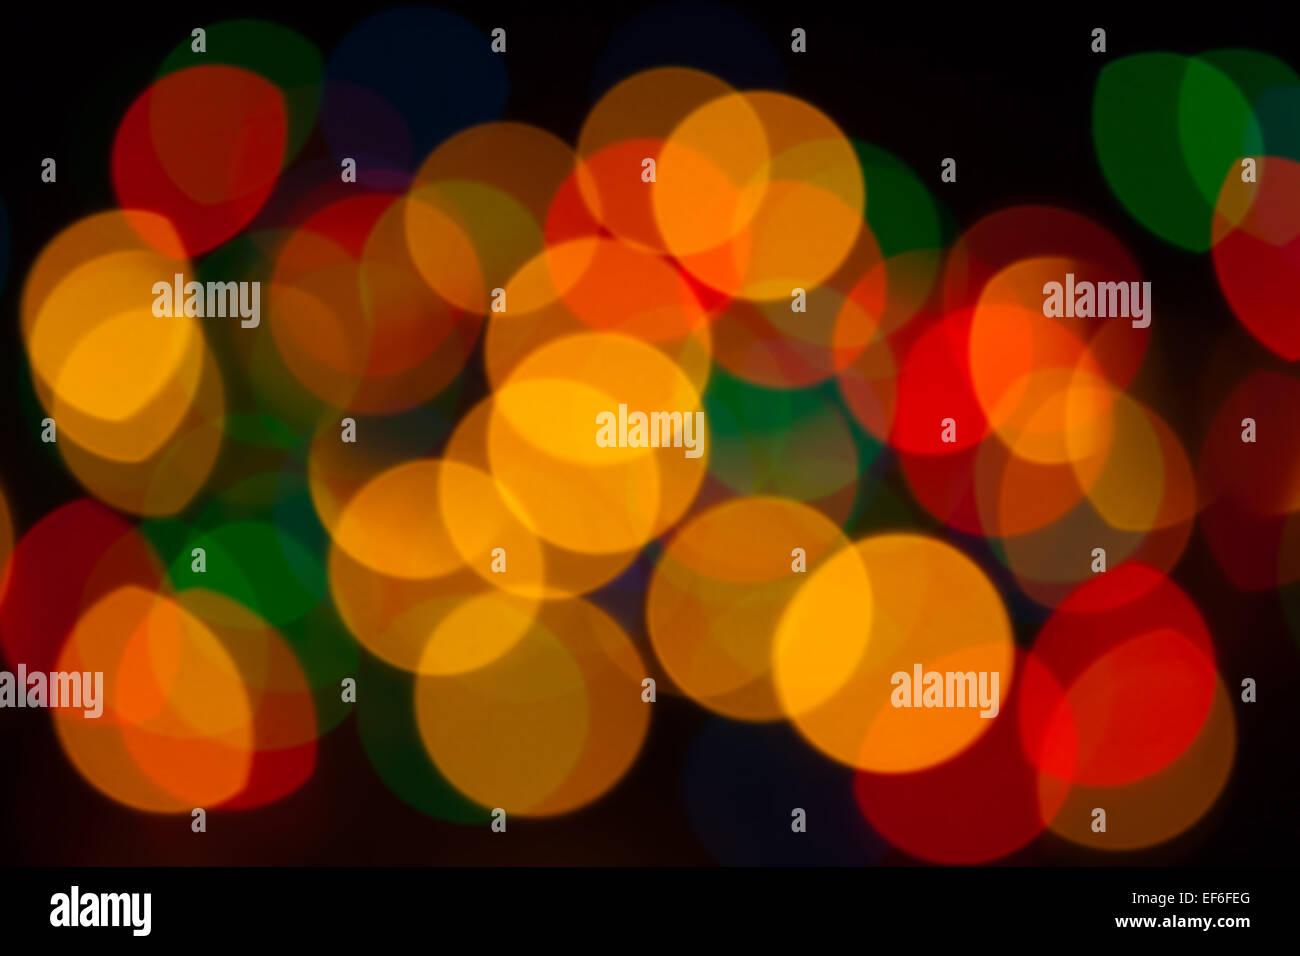 Resumen Antecedentes - desenfoque de objetos de colores luminosos sobre un fondo negro Imagen De Stock